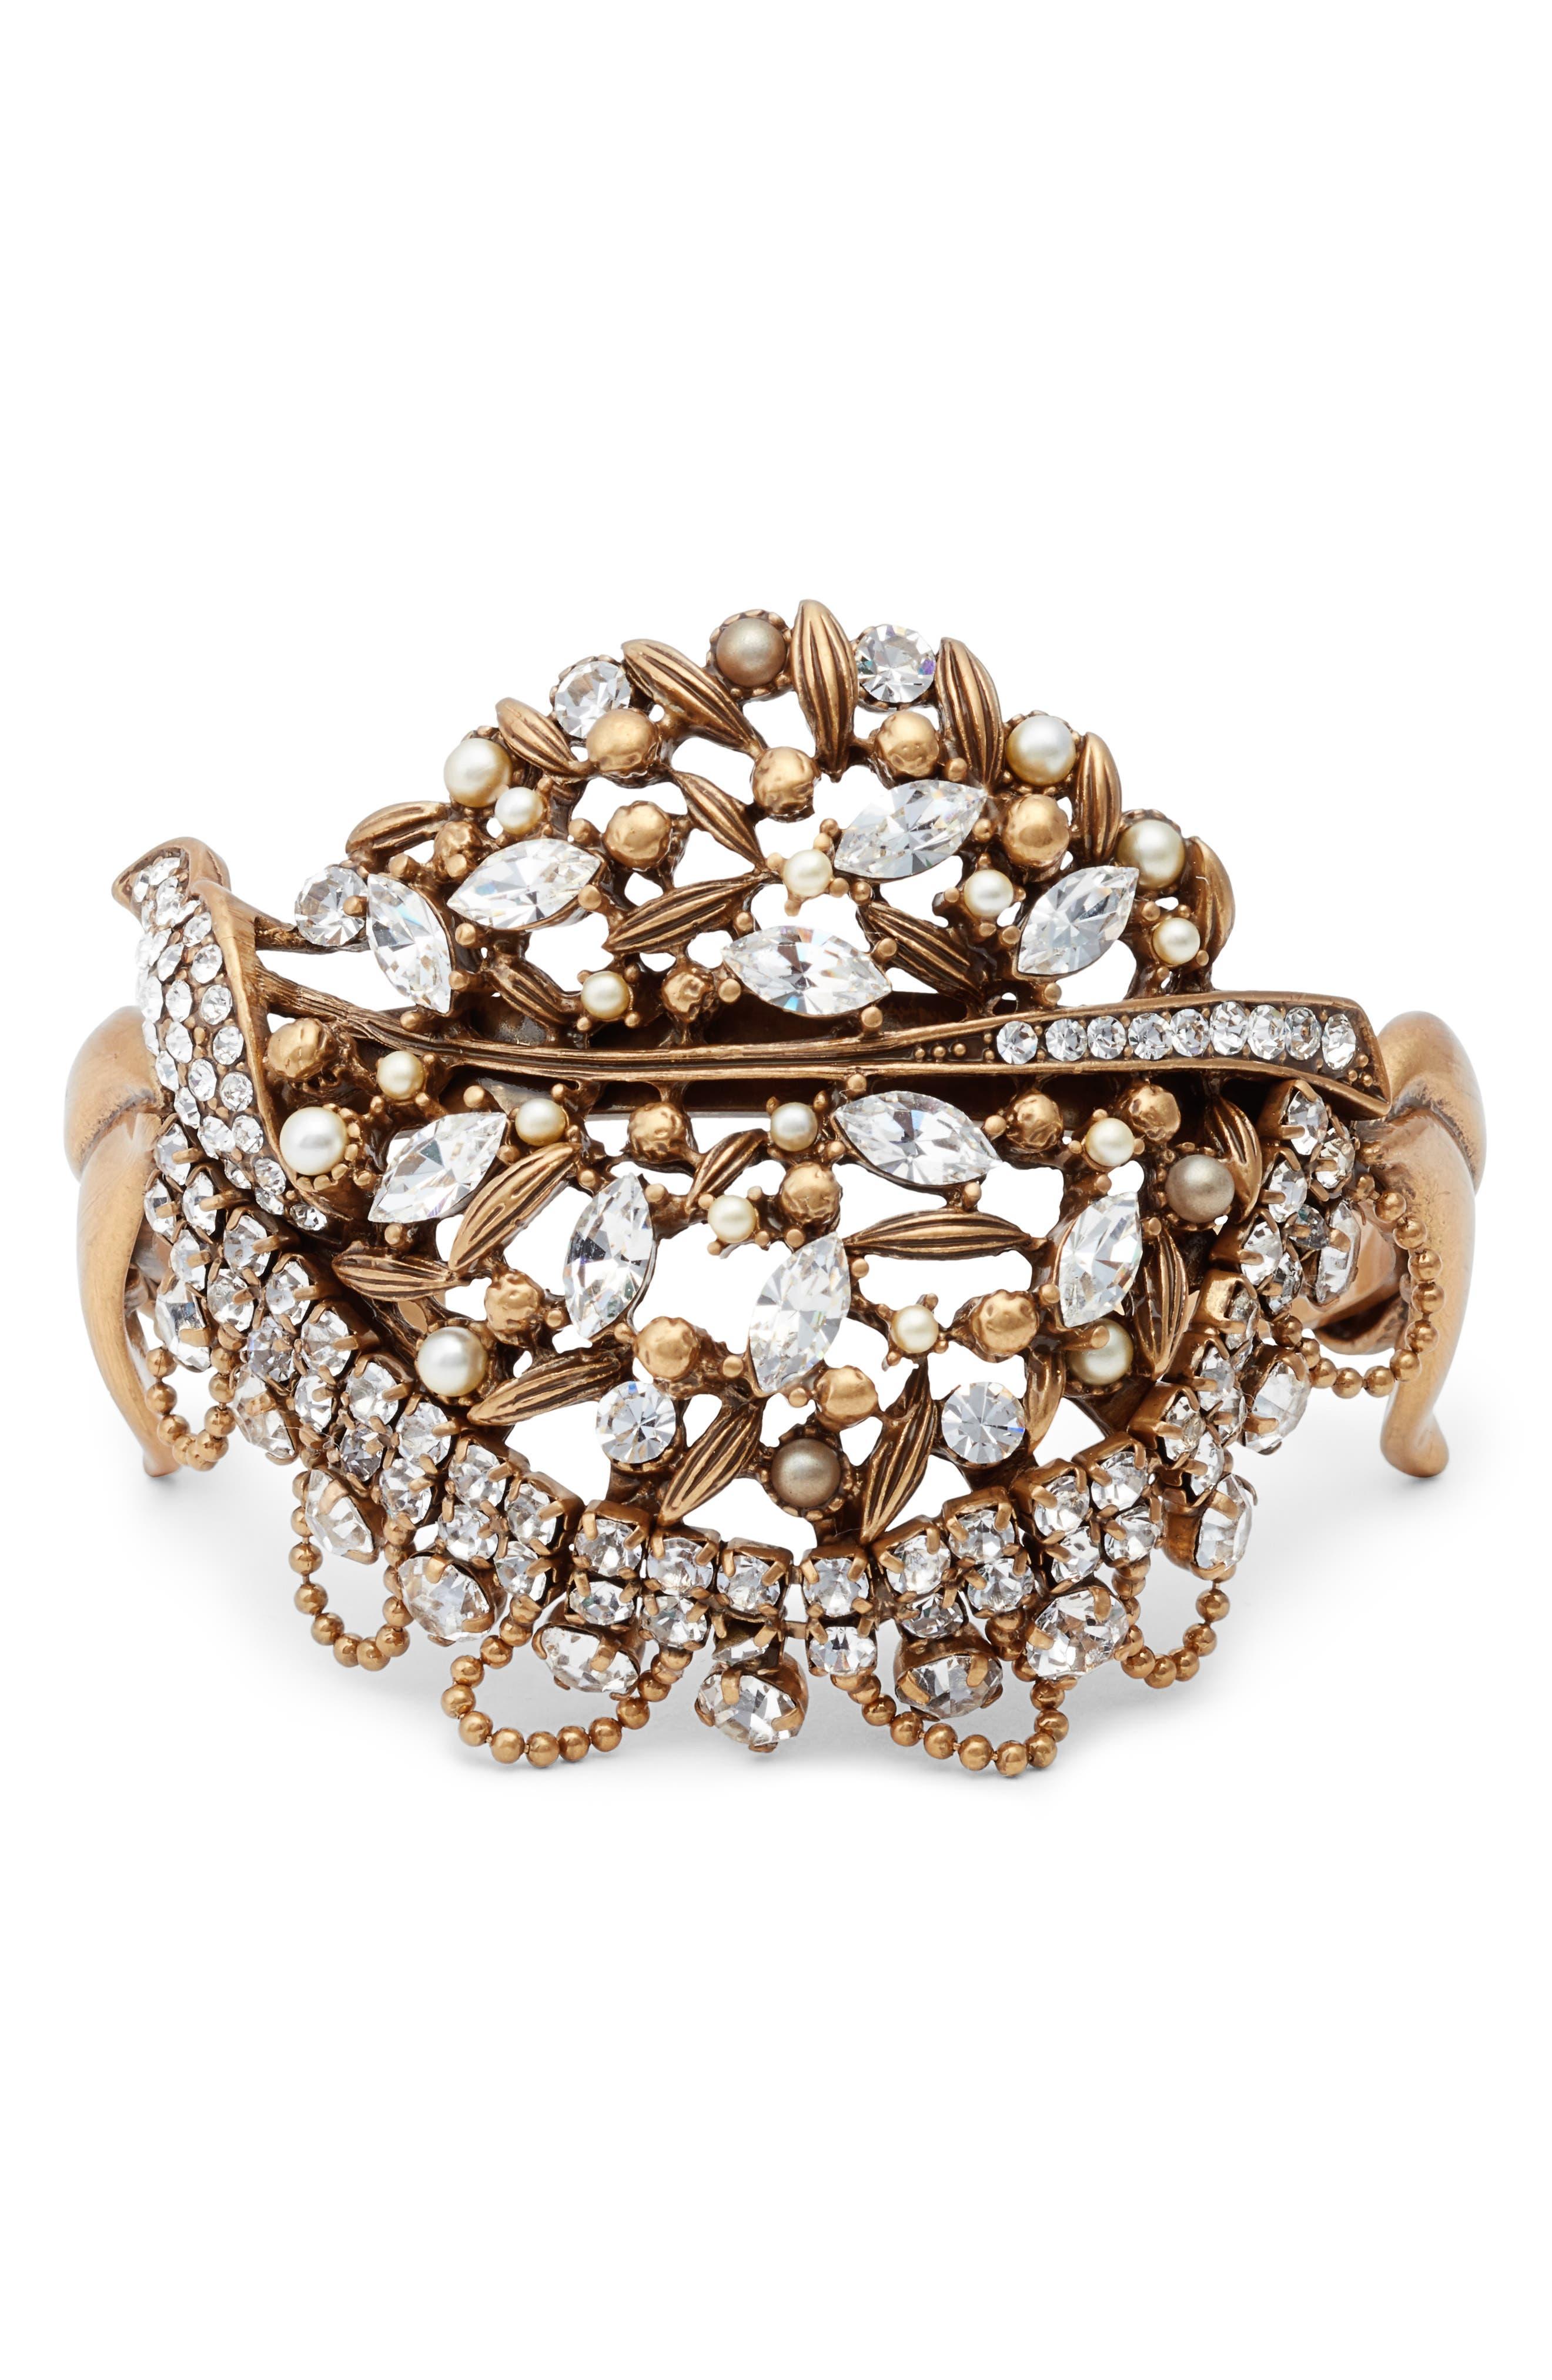 Main Image - Badgley Mischka Crystal Bracelet